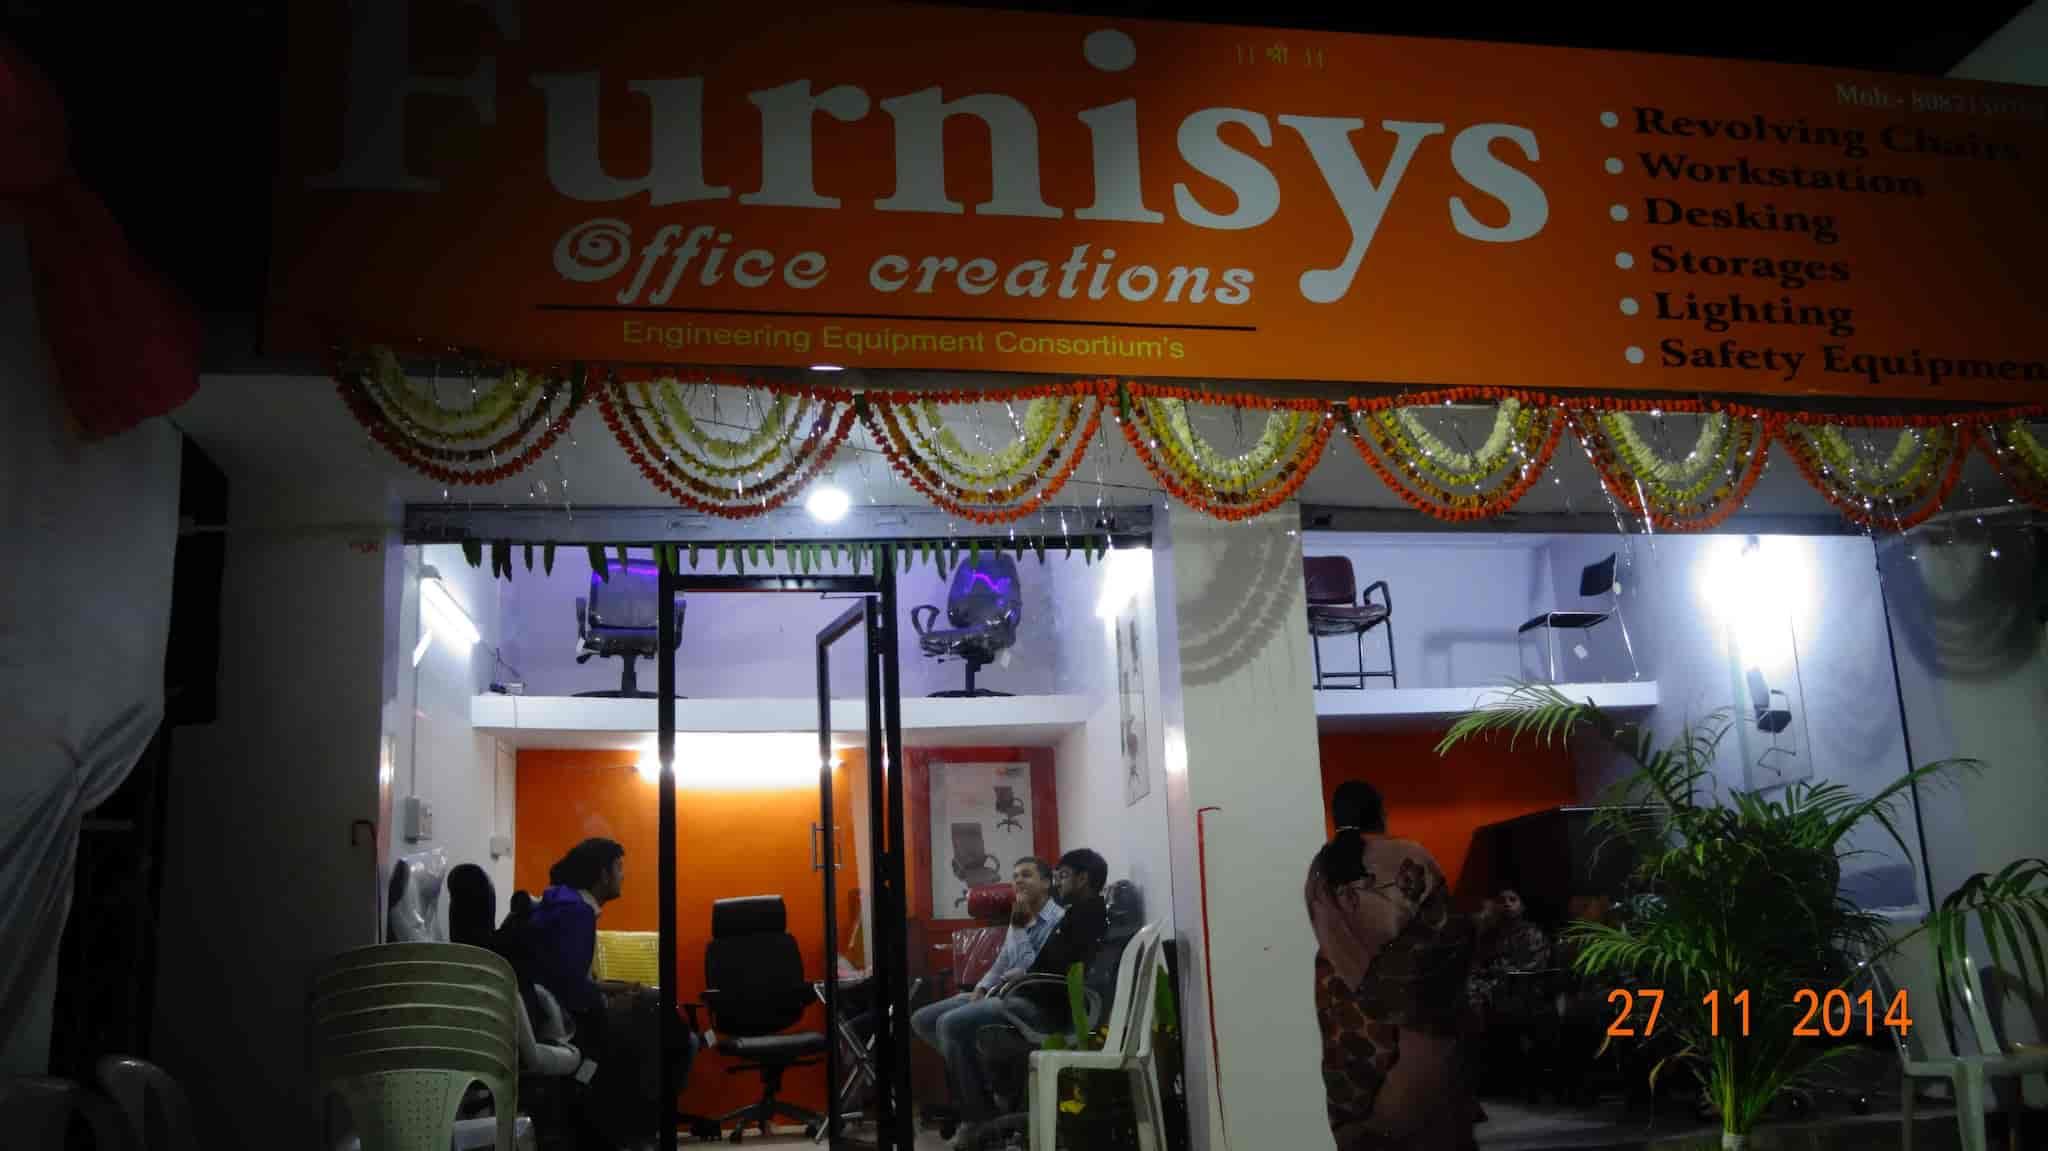 Furnisys Office Furniture And Modular Kitchens Photos Manewada